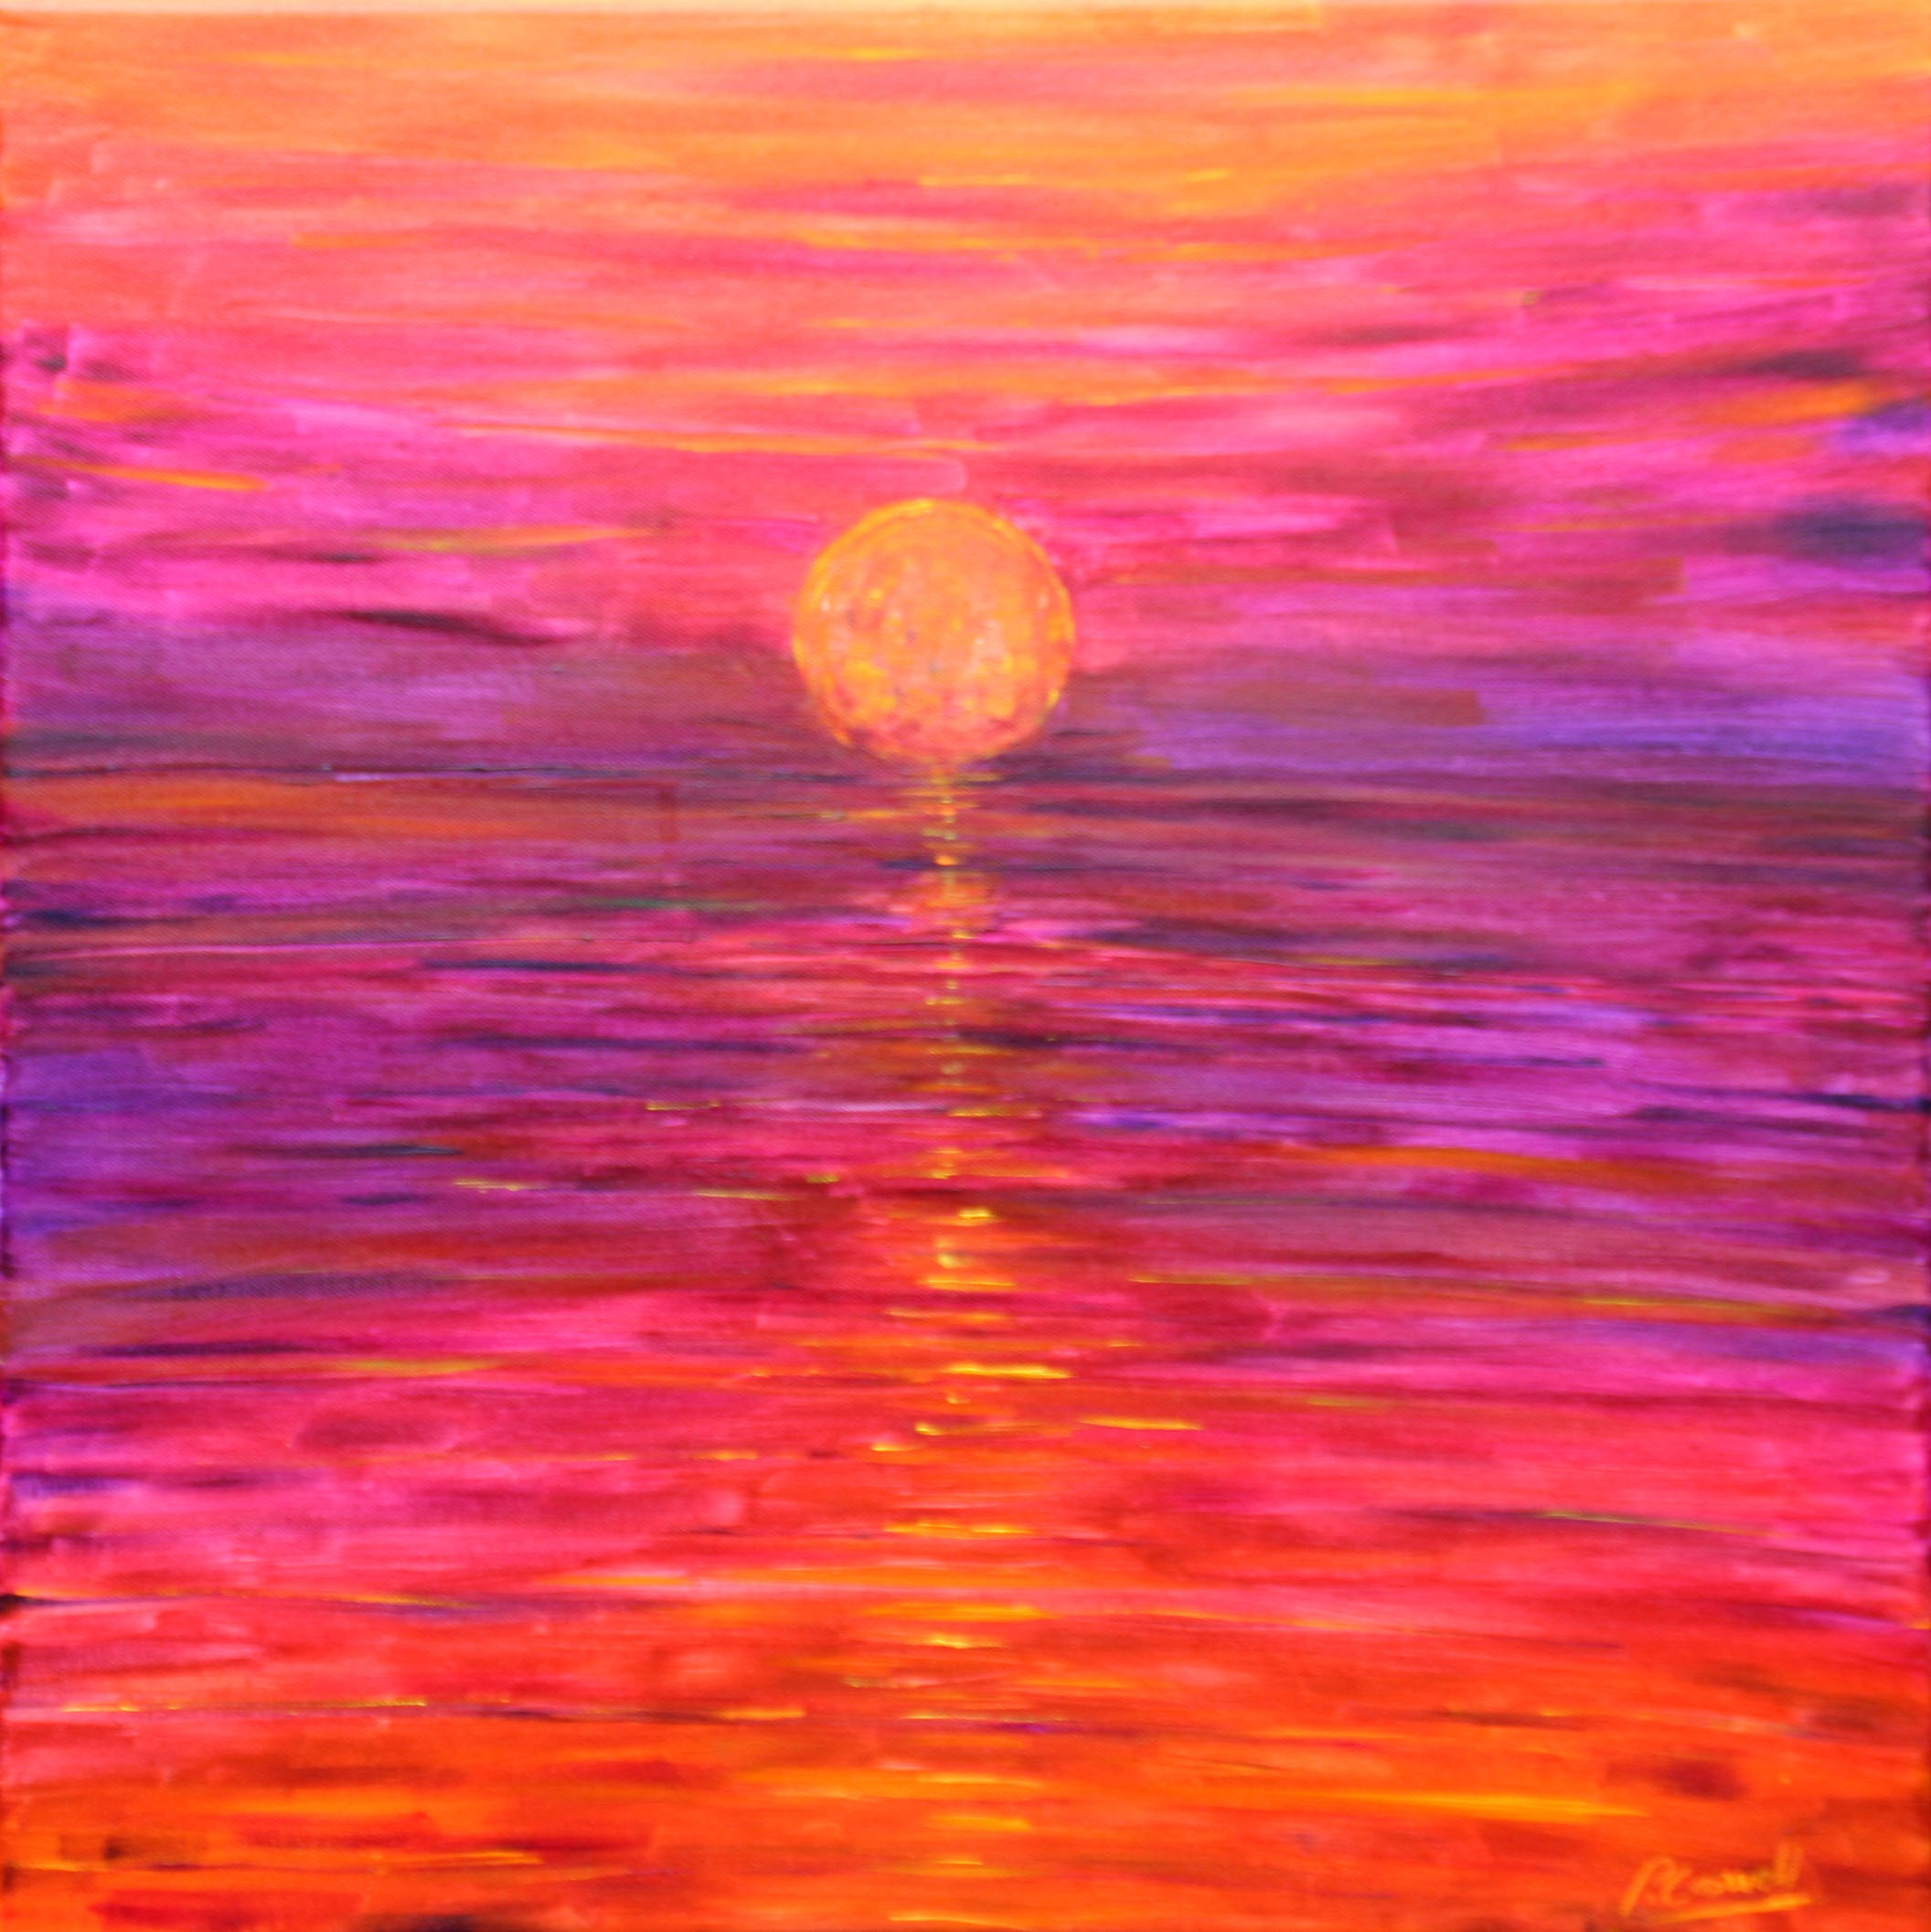 Putsborough beach sunset painting for sale